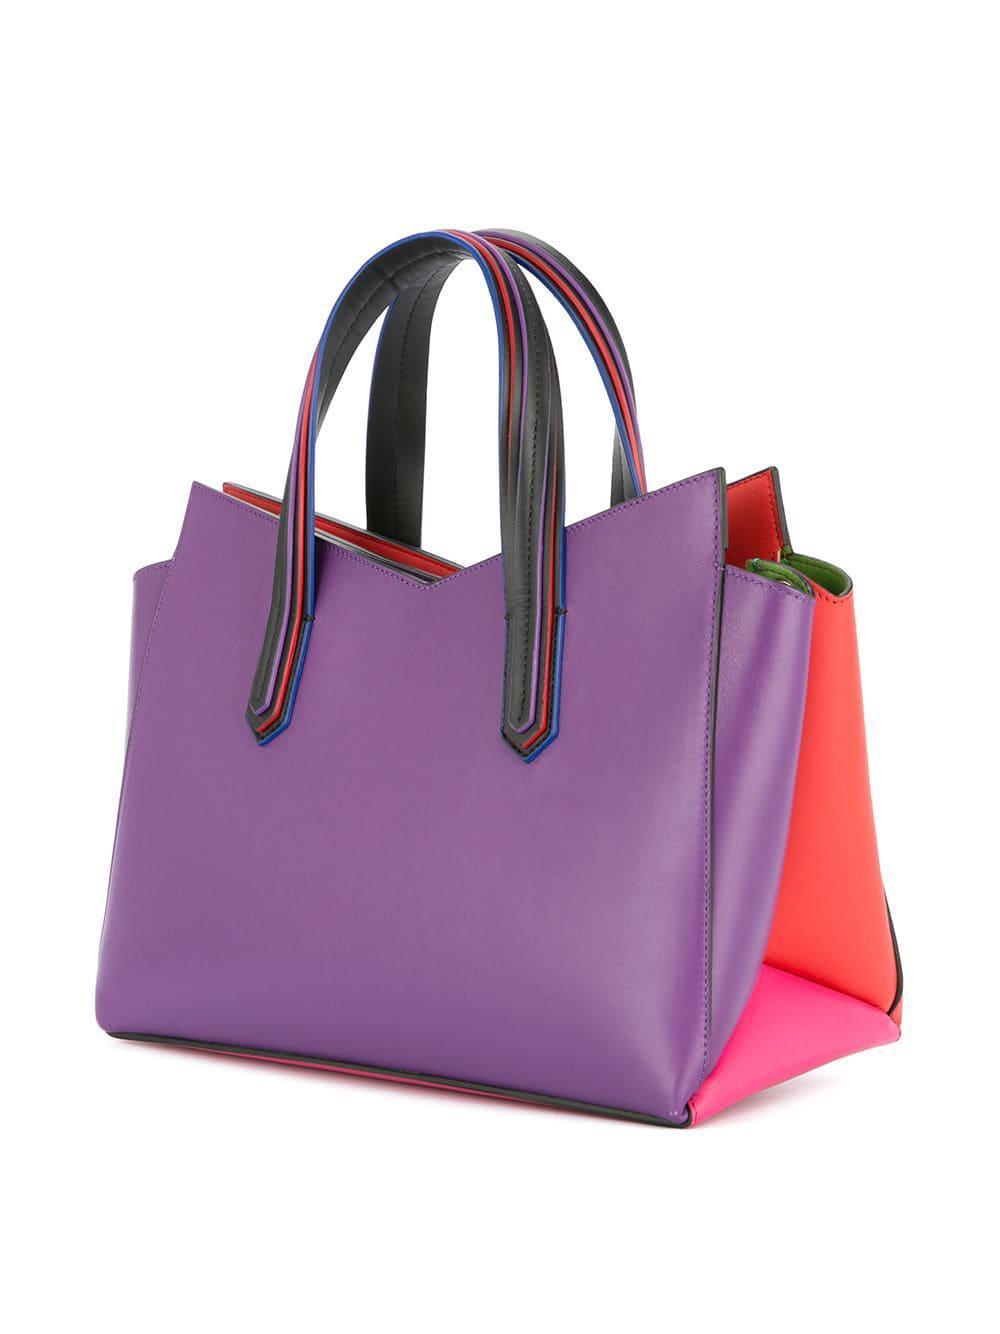 Colour Battaglia Tote Sara Lyst Bag Block FEHnnxA